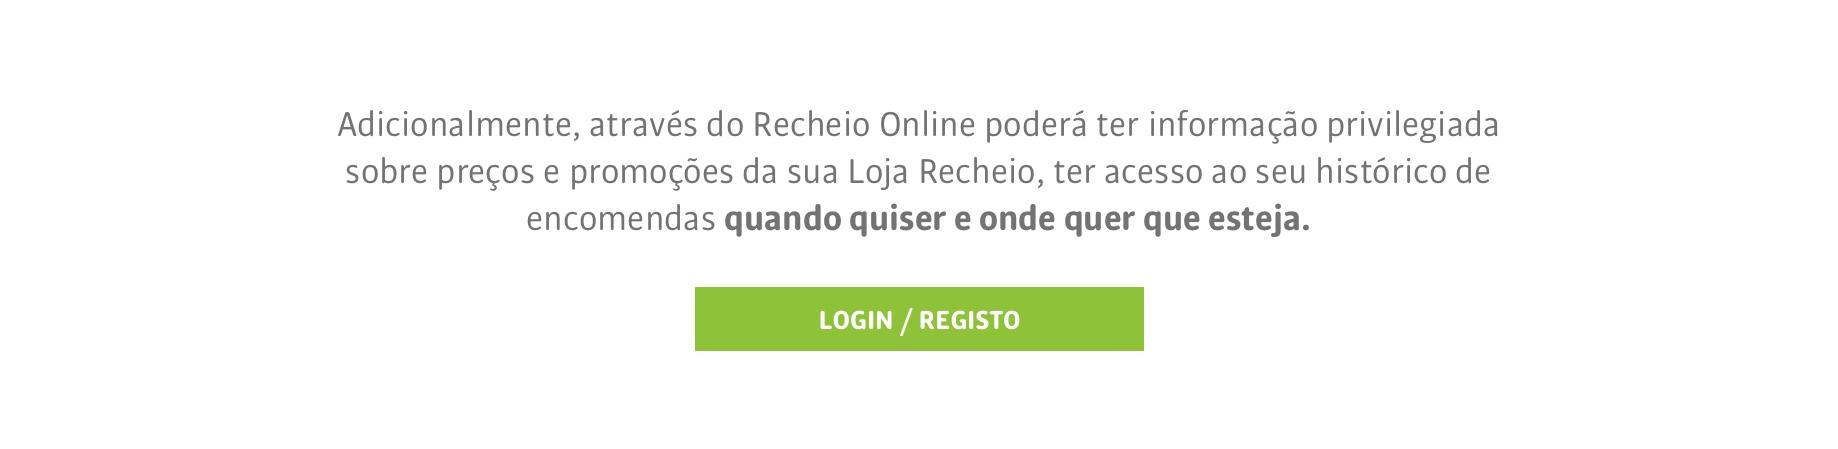 Recheio_LP_BemVindo_Bloco03